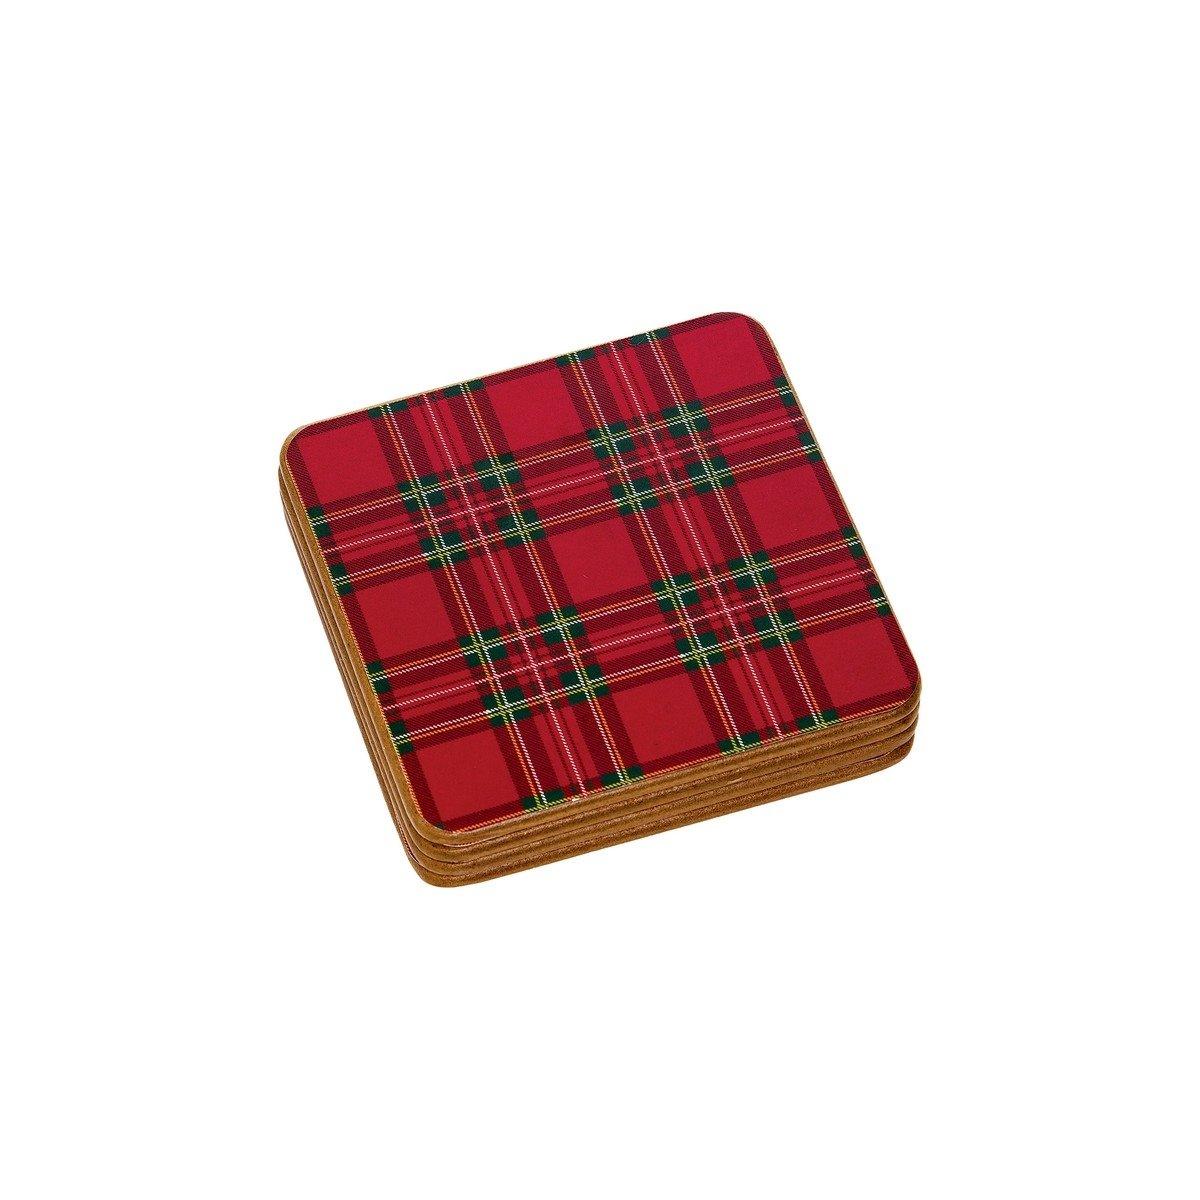 Red Tartan Plaid Hardboard Coaster Set of 4